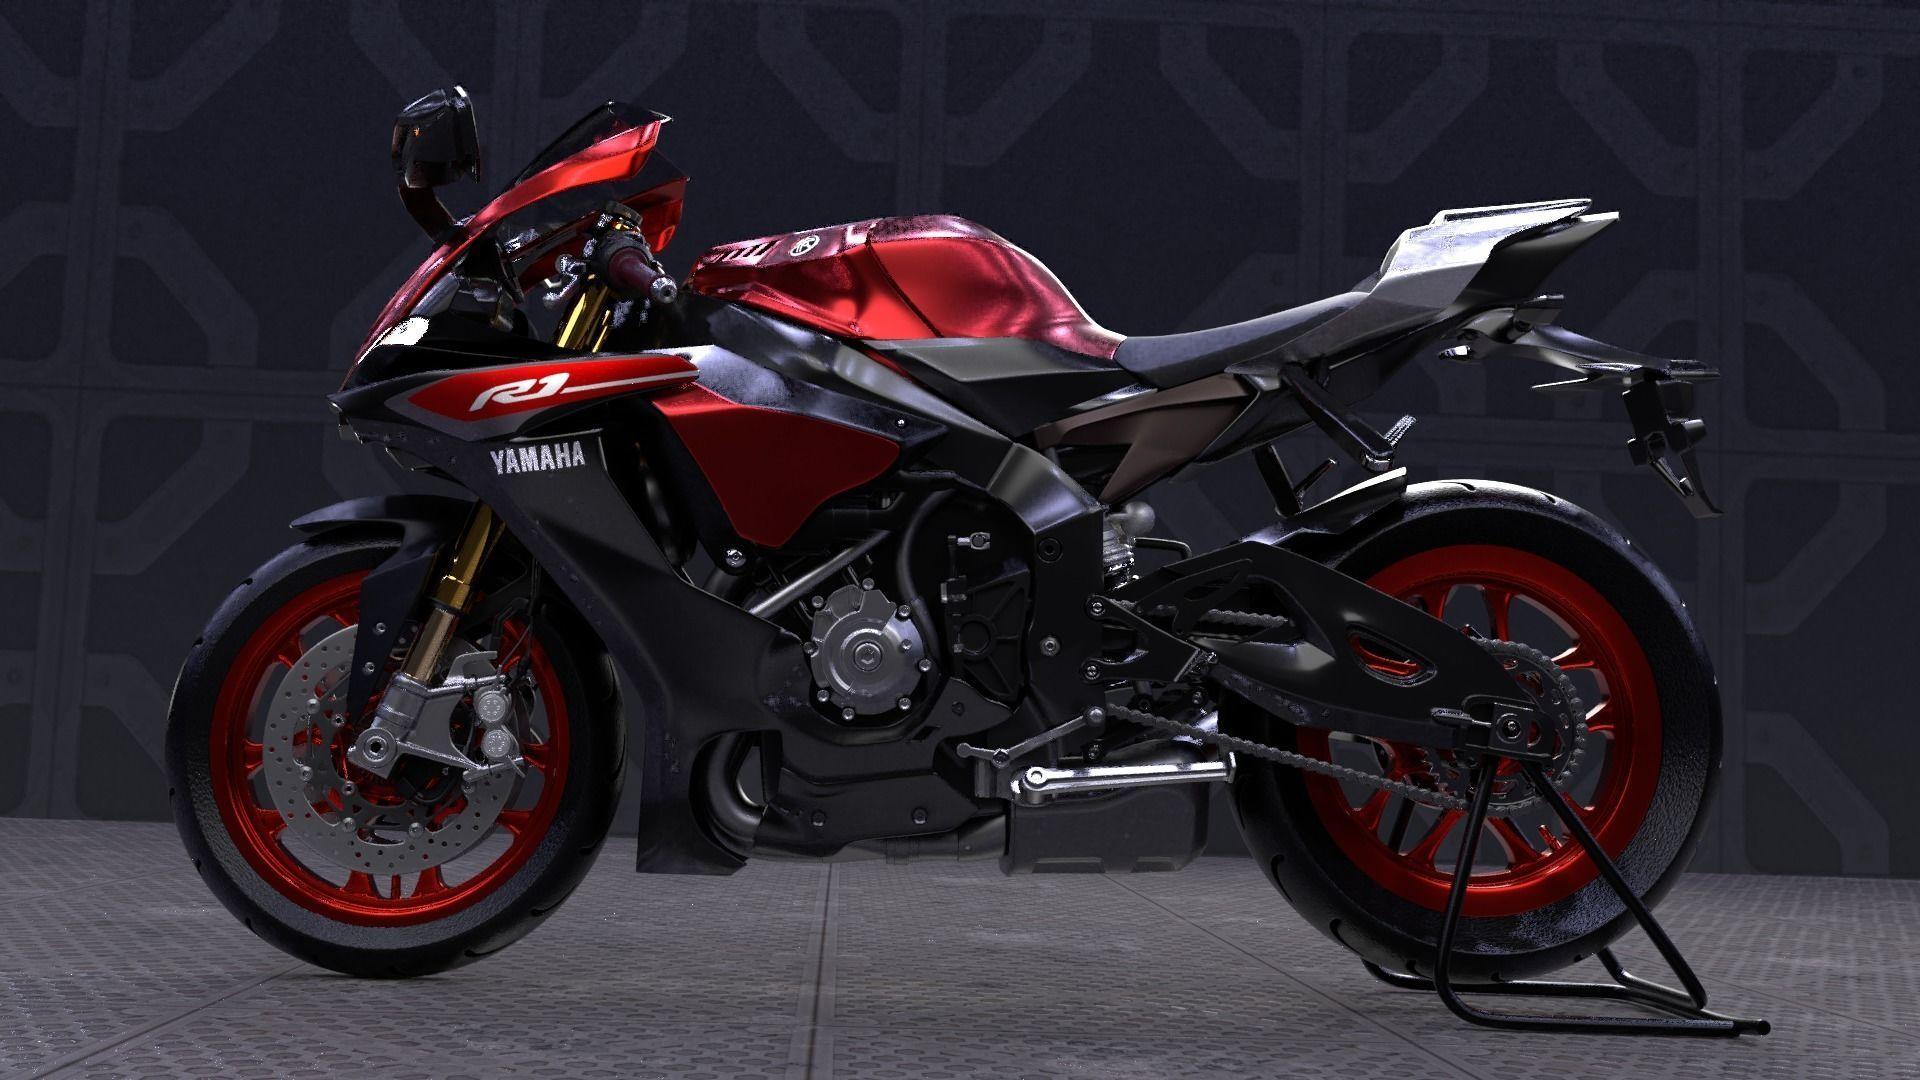 Yamaha R1 2015 Motorcycle